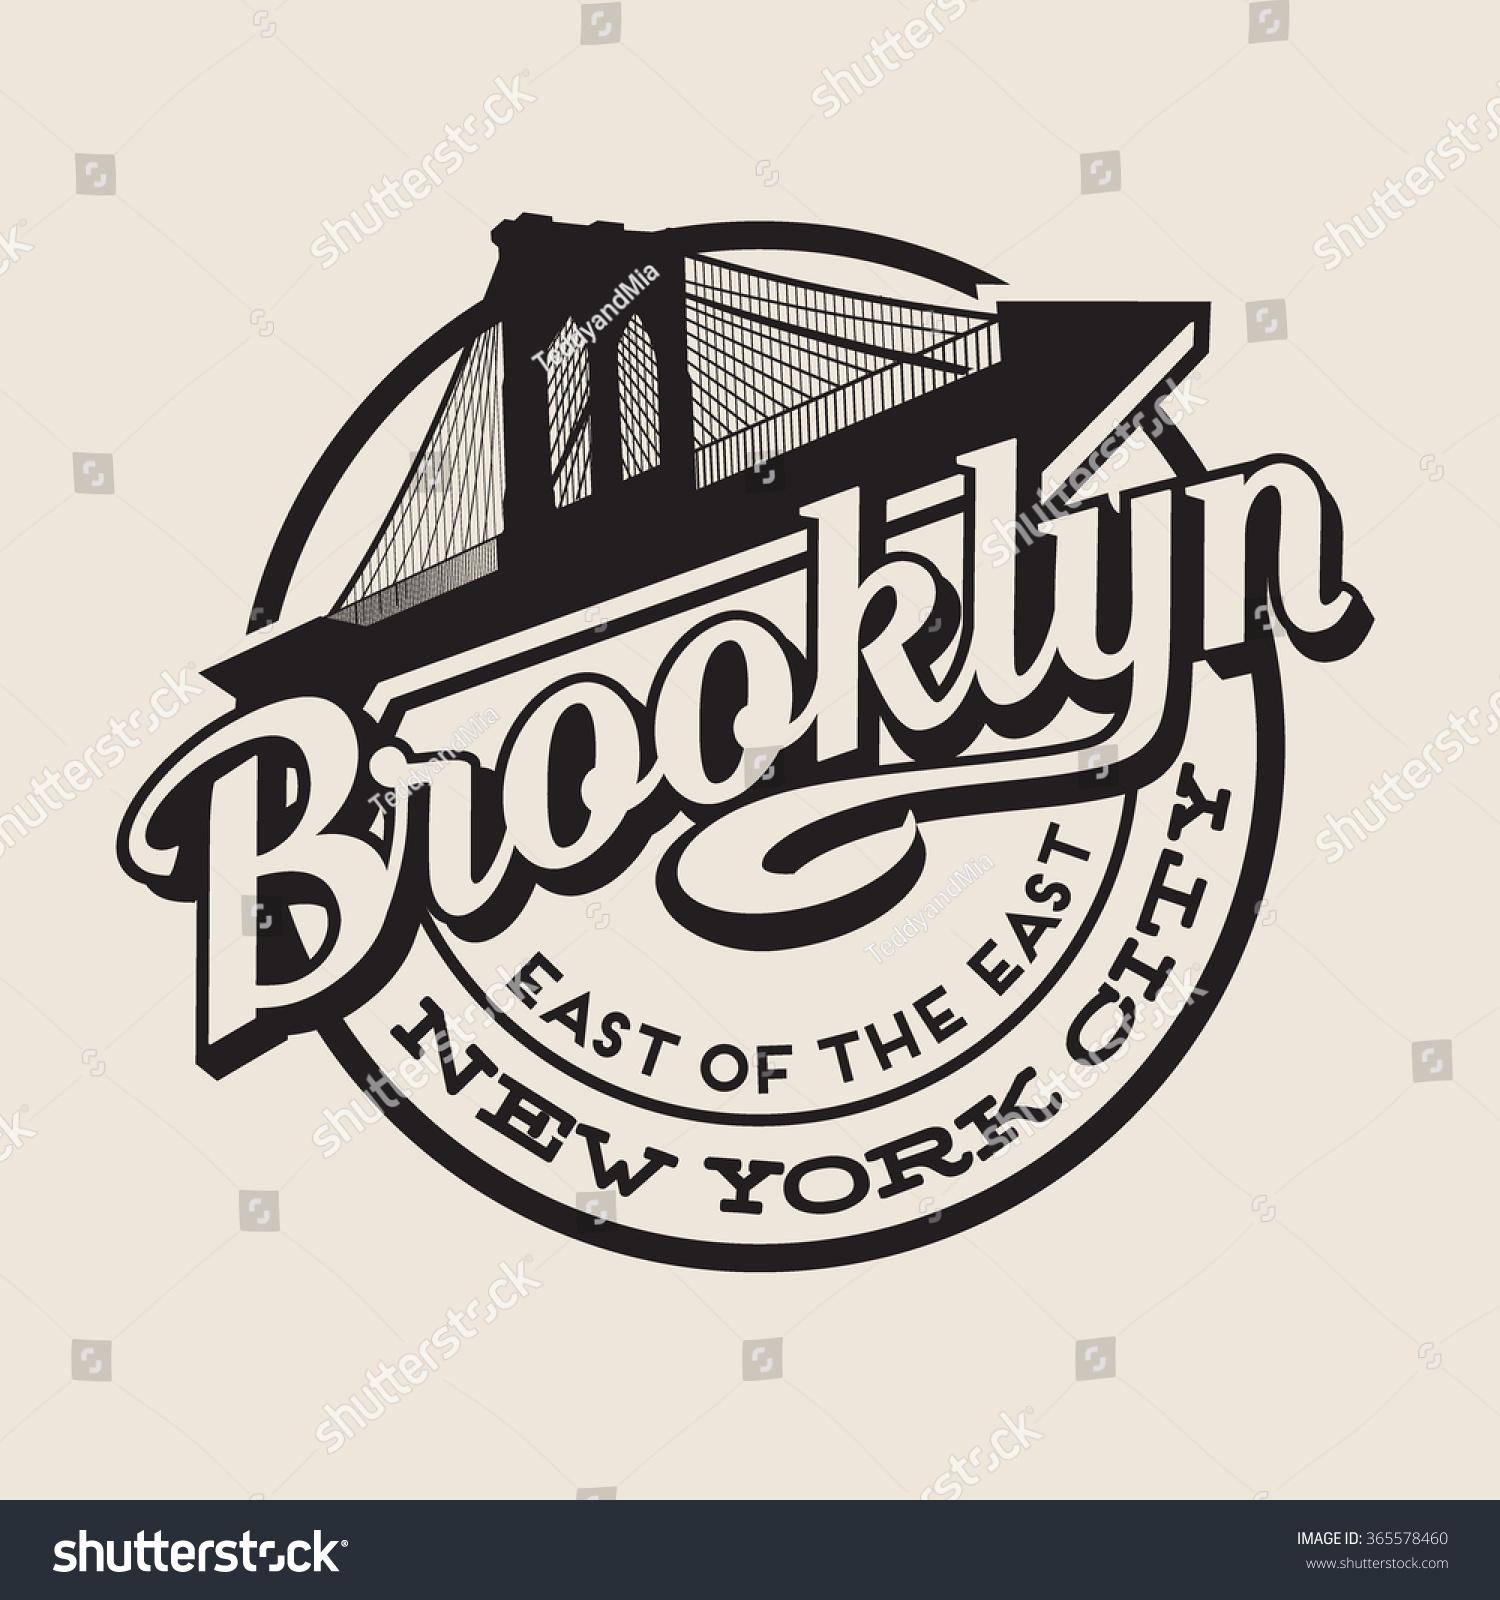 Brooklyn new york city retro vintage stock vector for Vintage t shirt printing